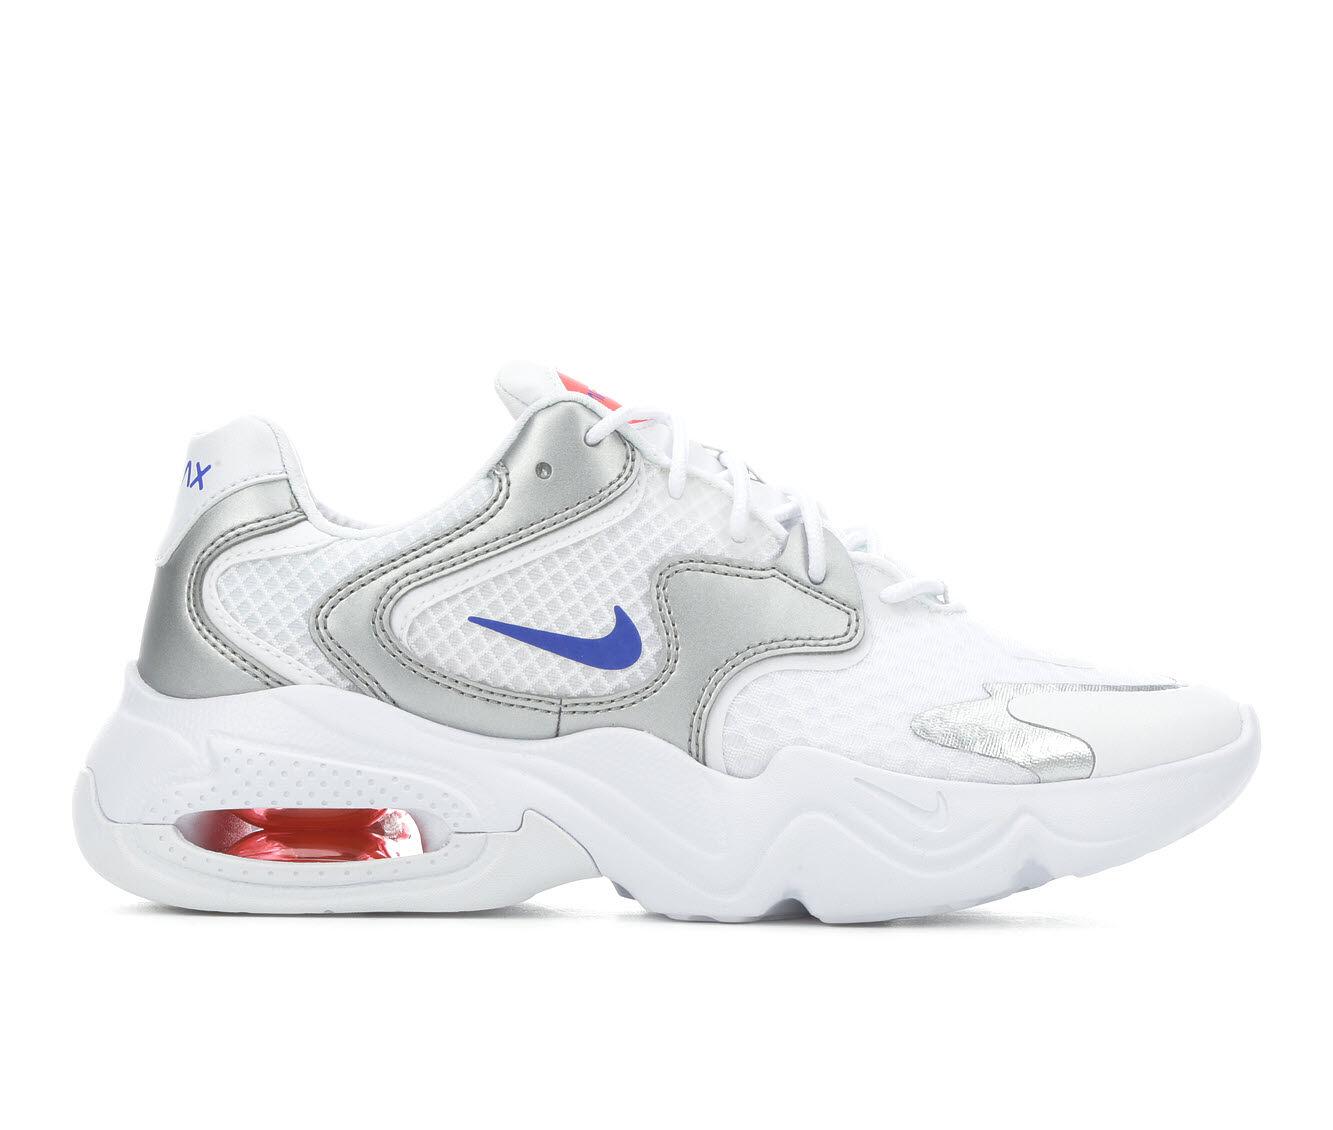 Women's Nike Air Max 2X Sneakers   Shoe